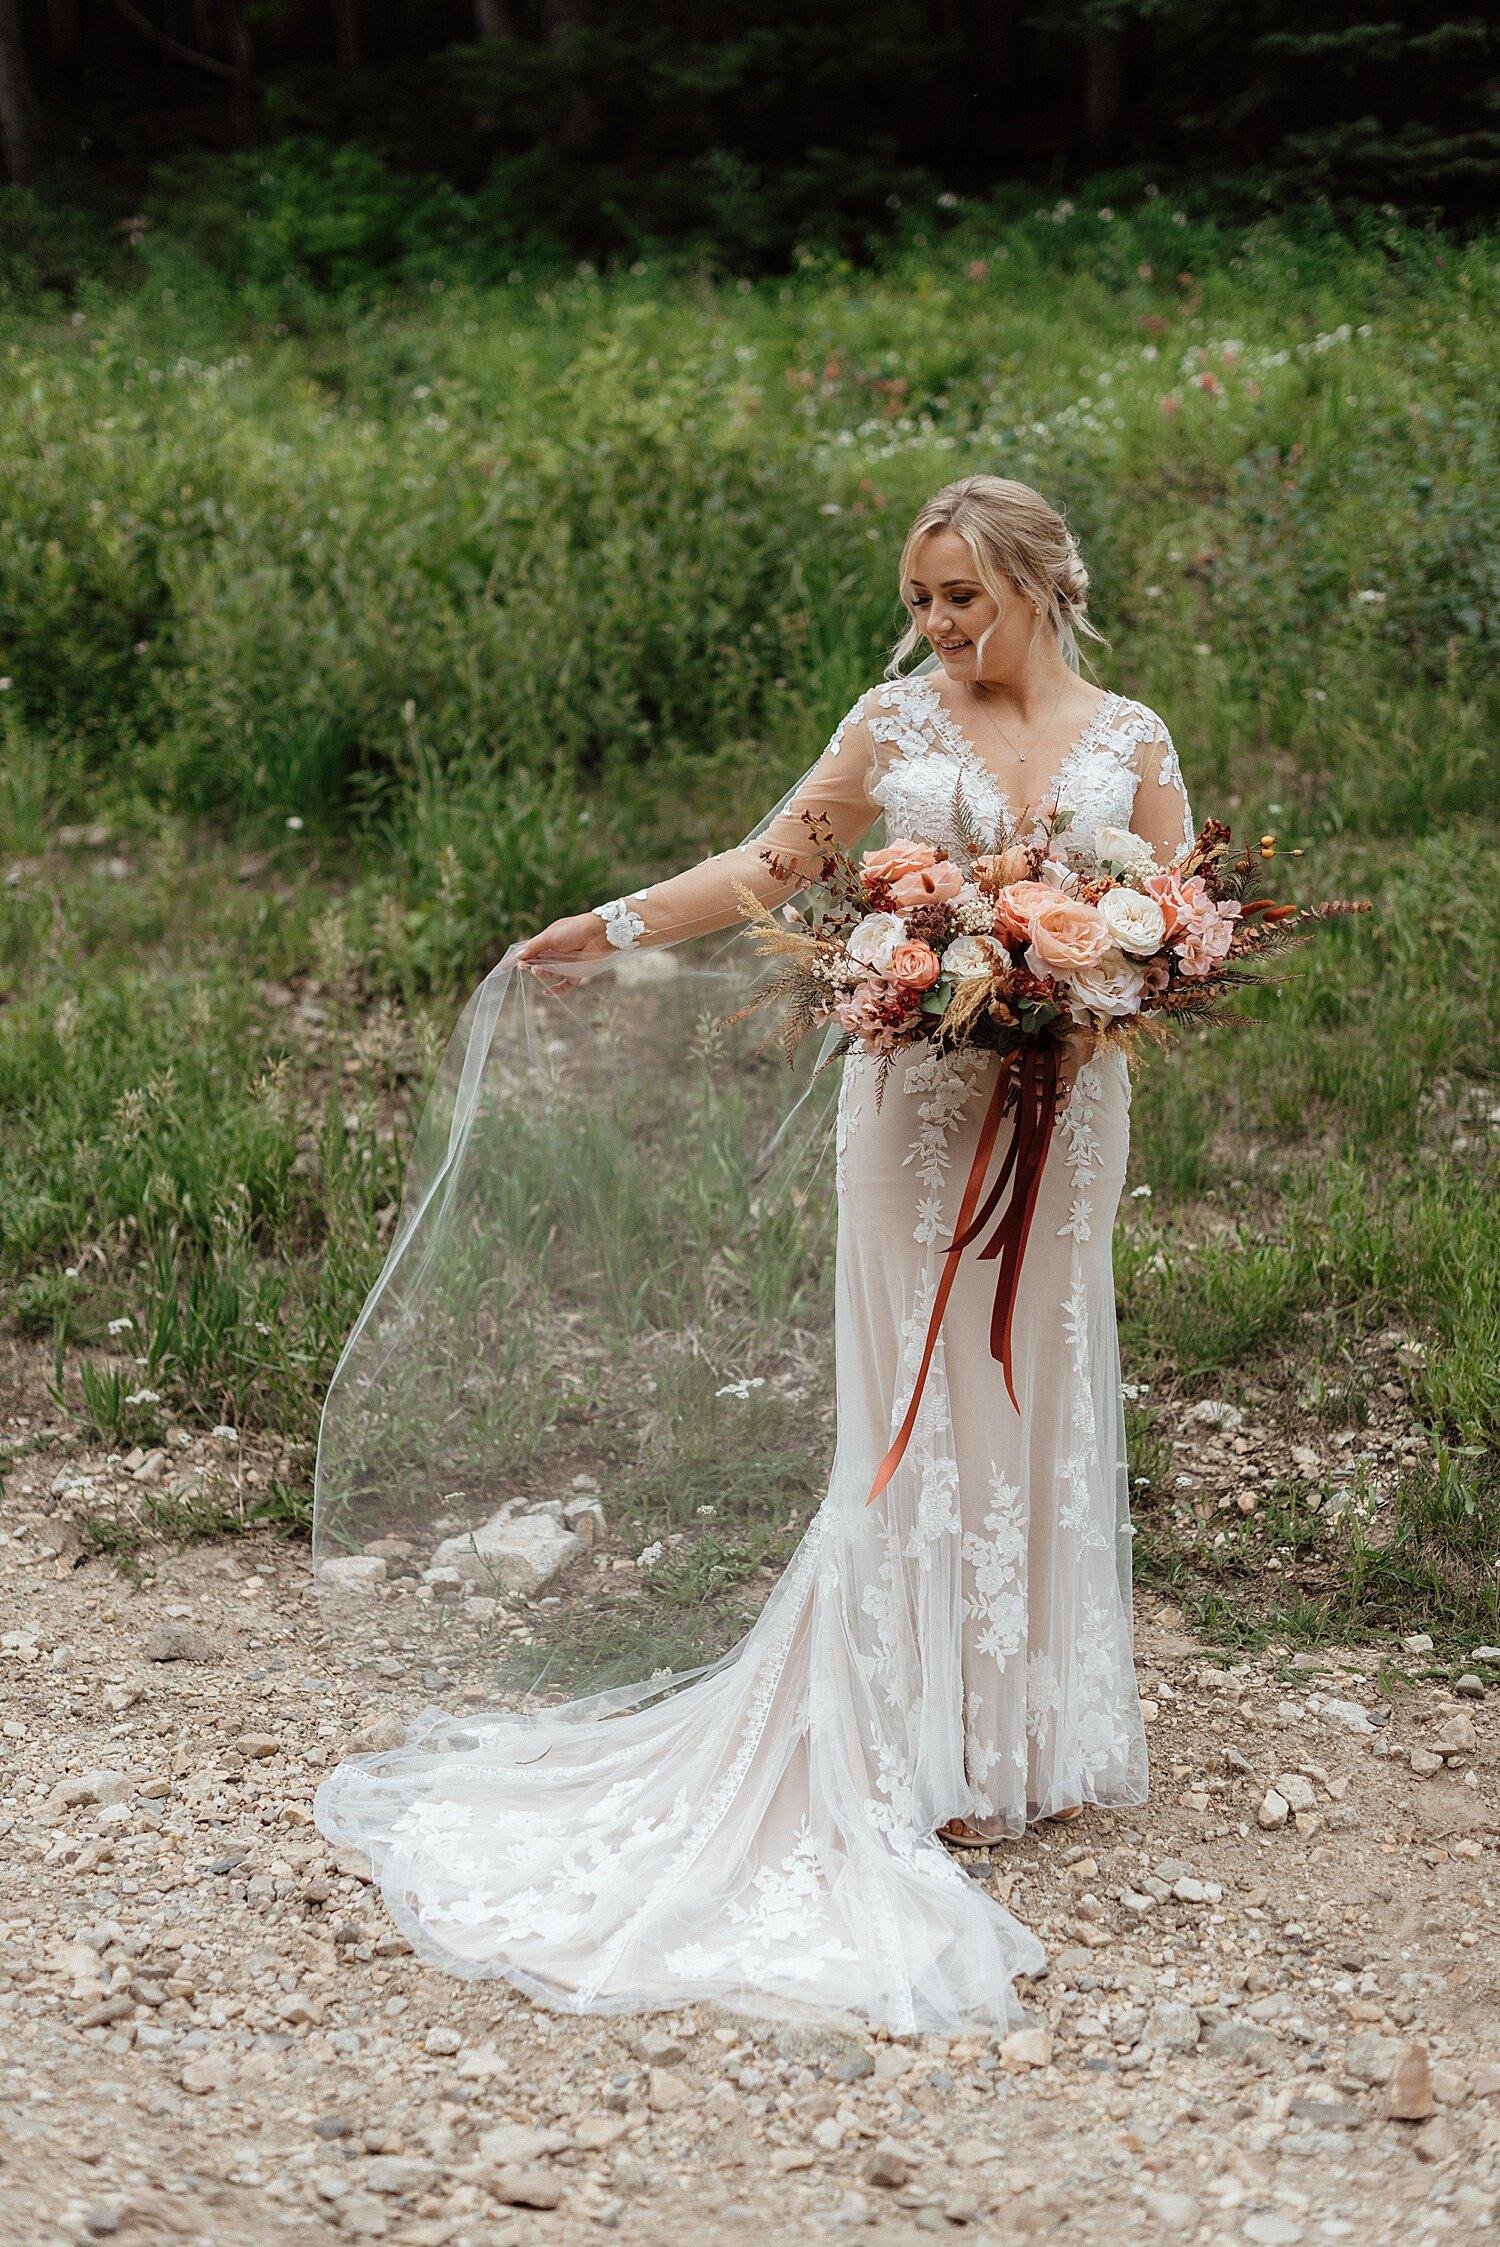 Zandra Barriga Photo - Hunter and Brighton Mountain Bridals_0012.jpg